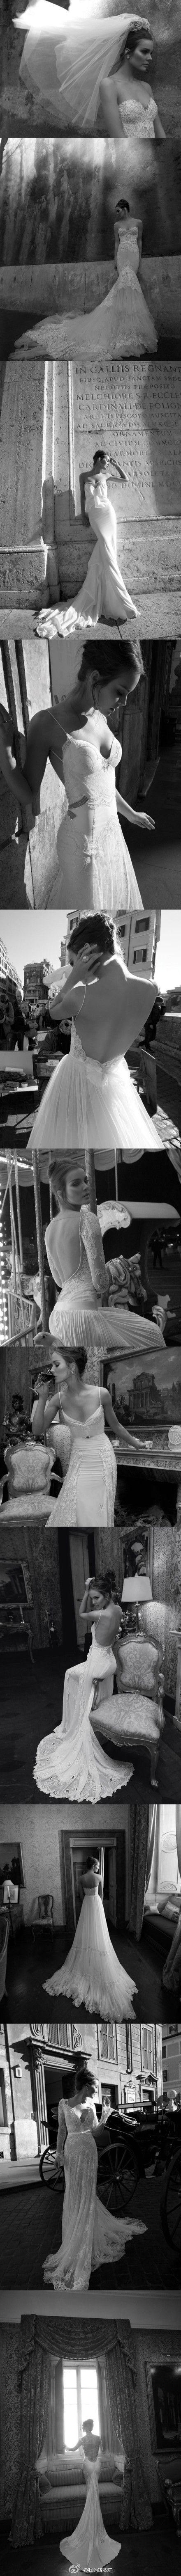 Gorgeous wedding dress editorial!